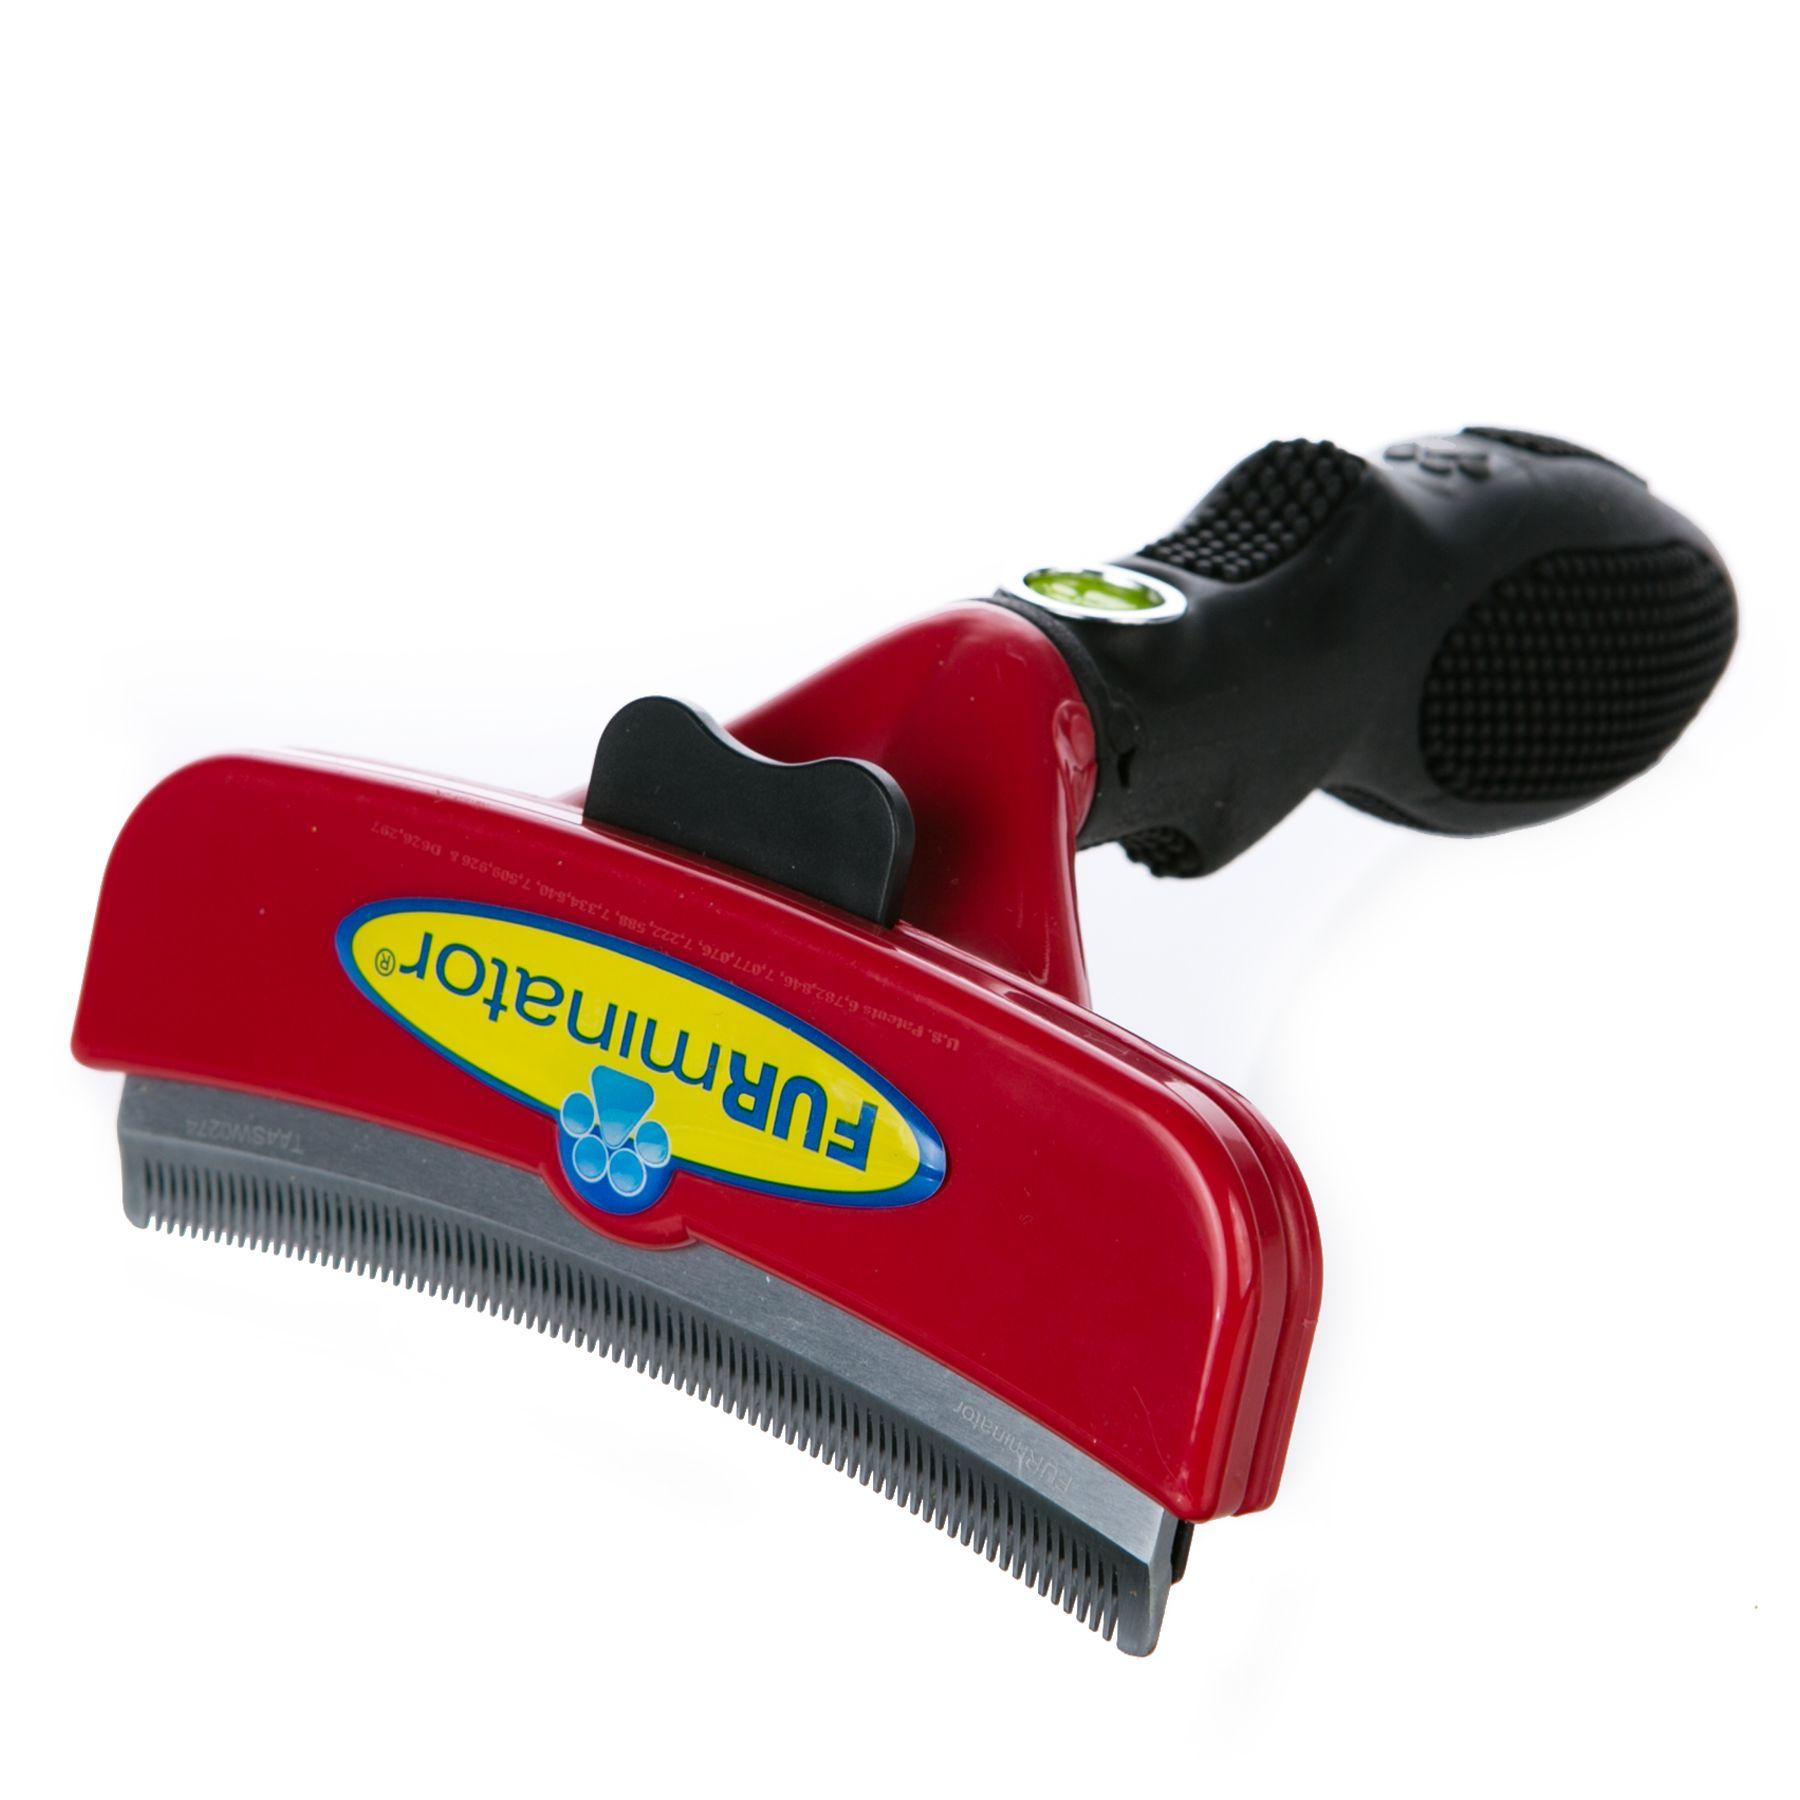 FURminator FURflex, Comfort Edge Contoured deShedding Dog Tool size: Large 5238741